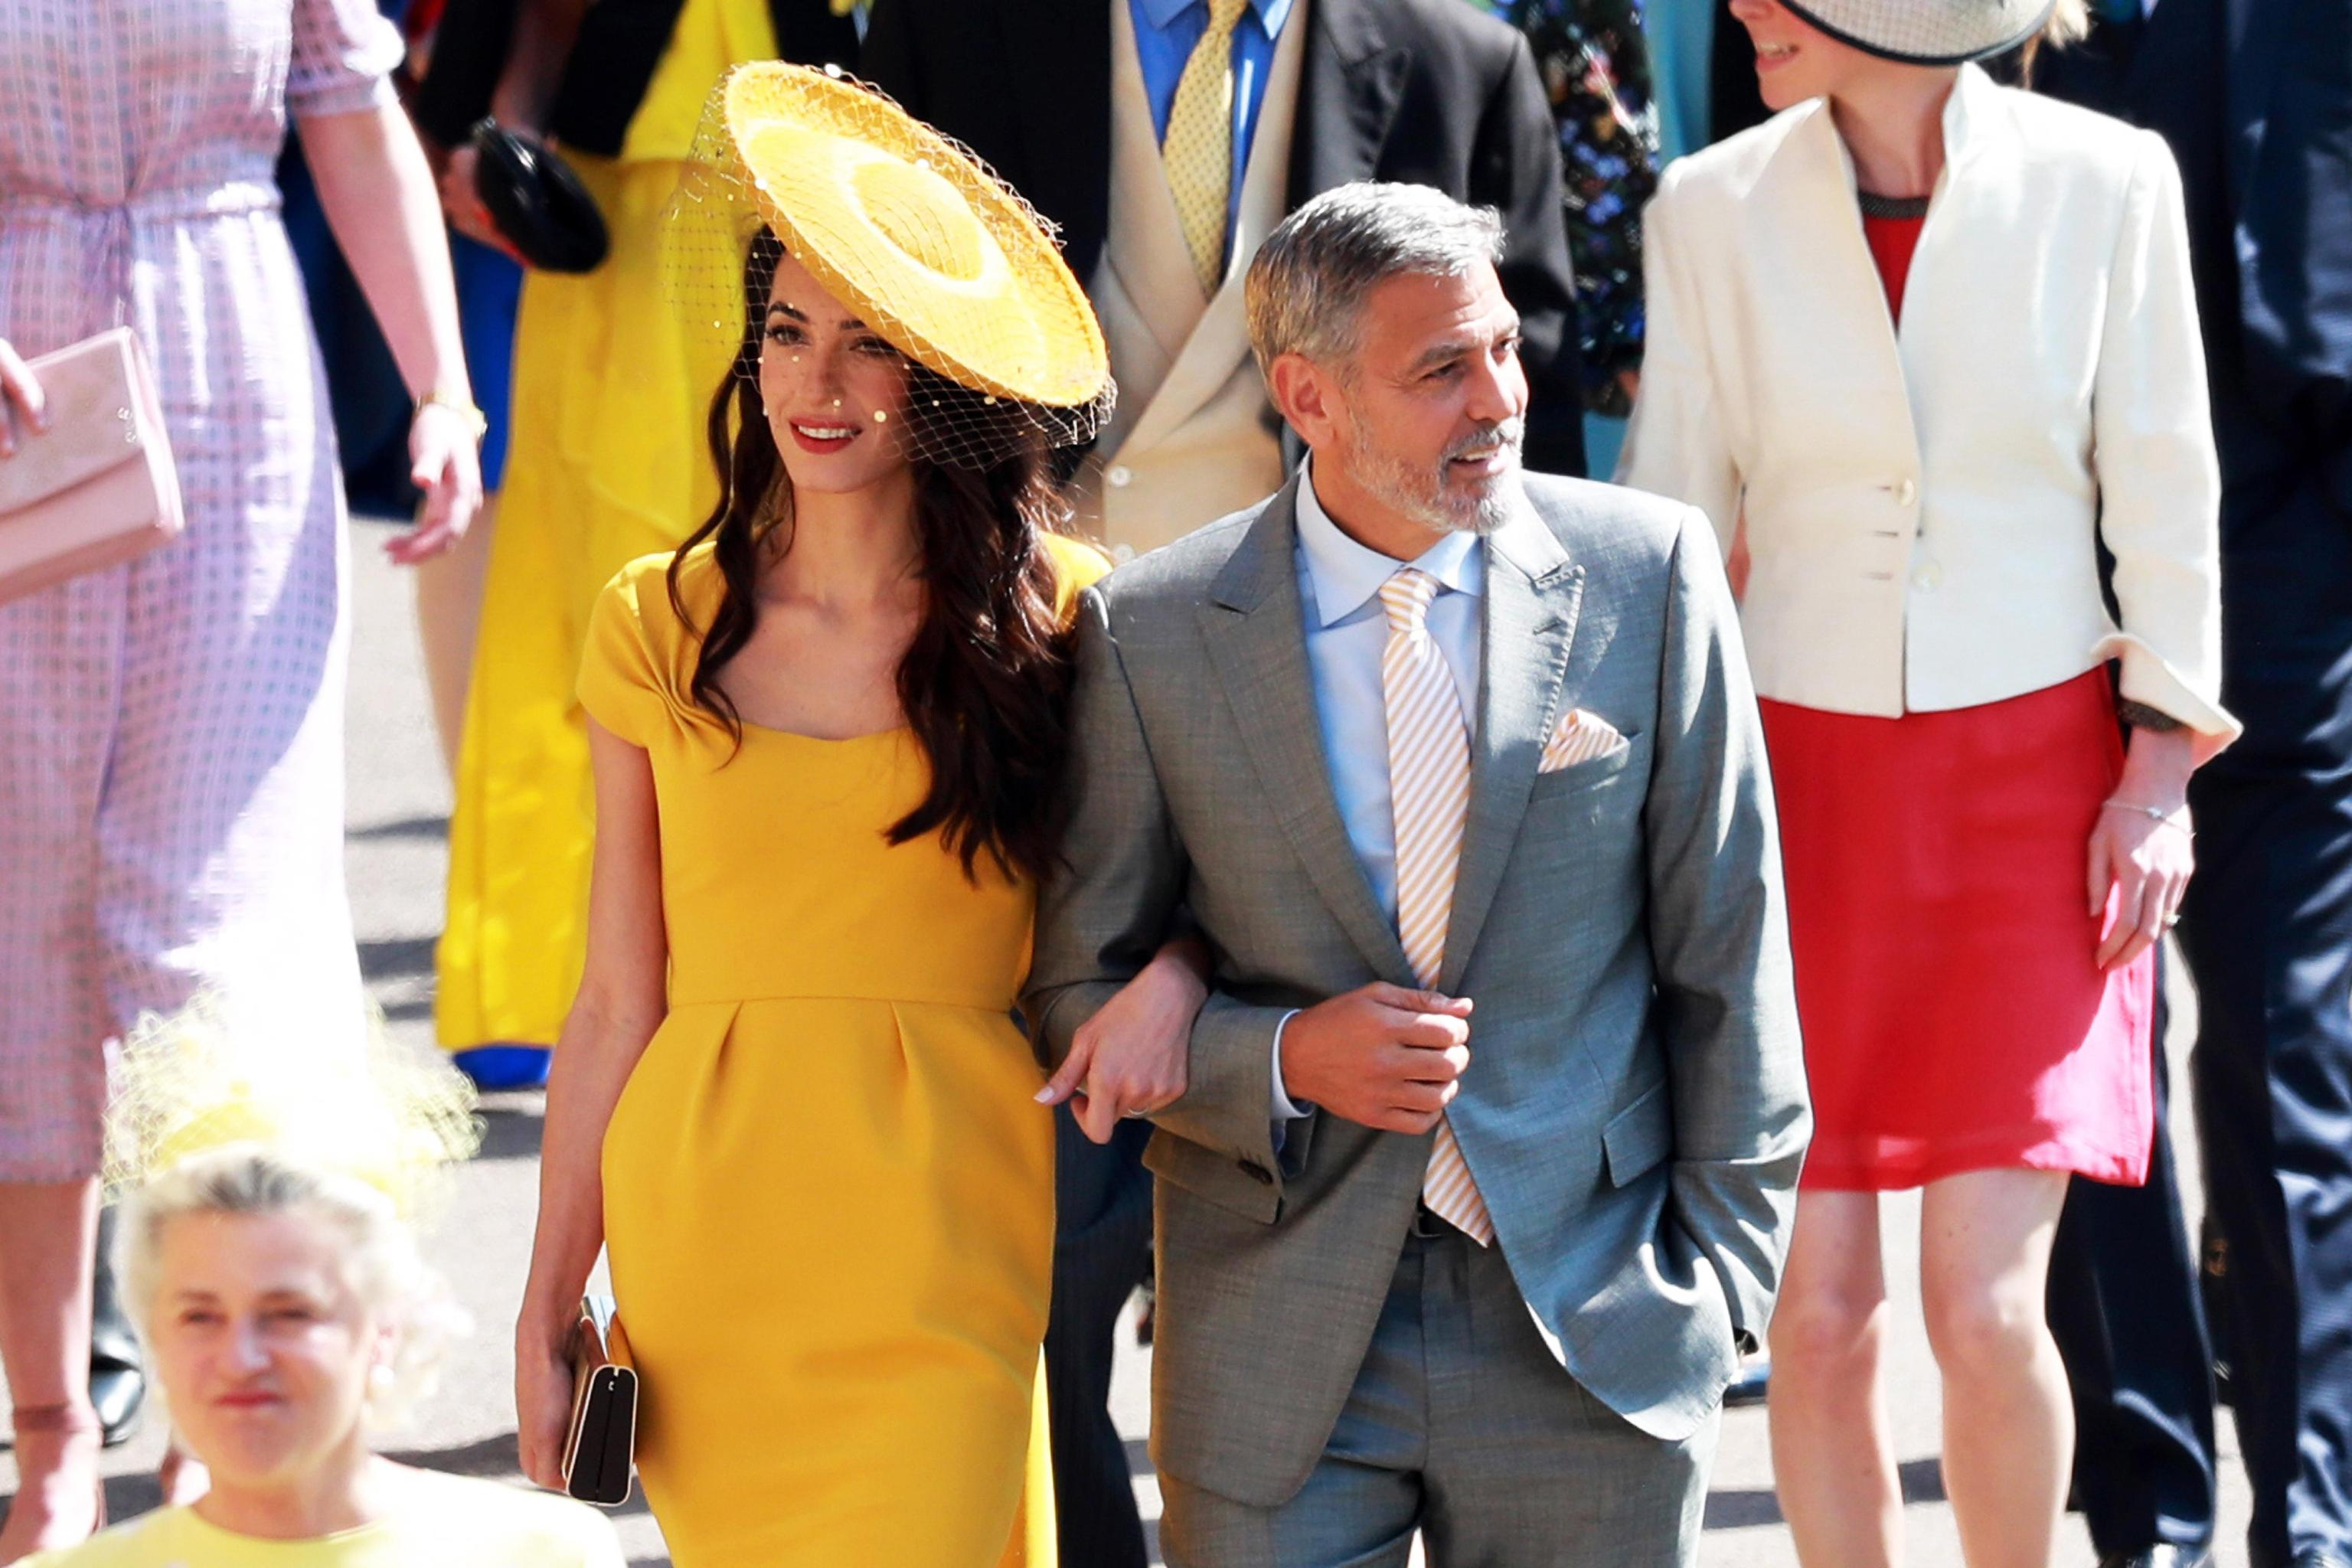 Amal Clooney con cappello da cerimonia a tesa larga al matrimonio tra il Principe Harry e Meghan Markle